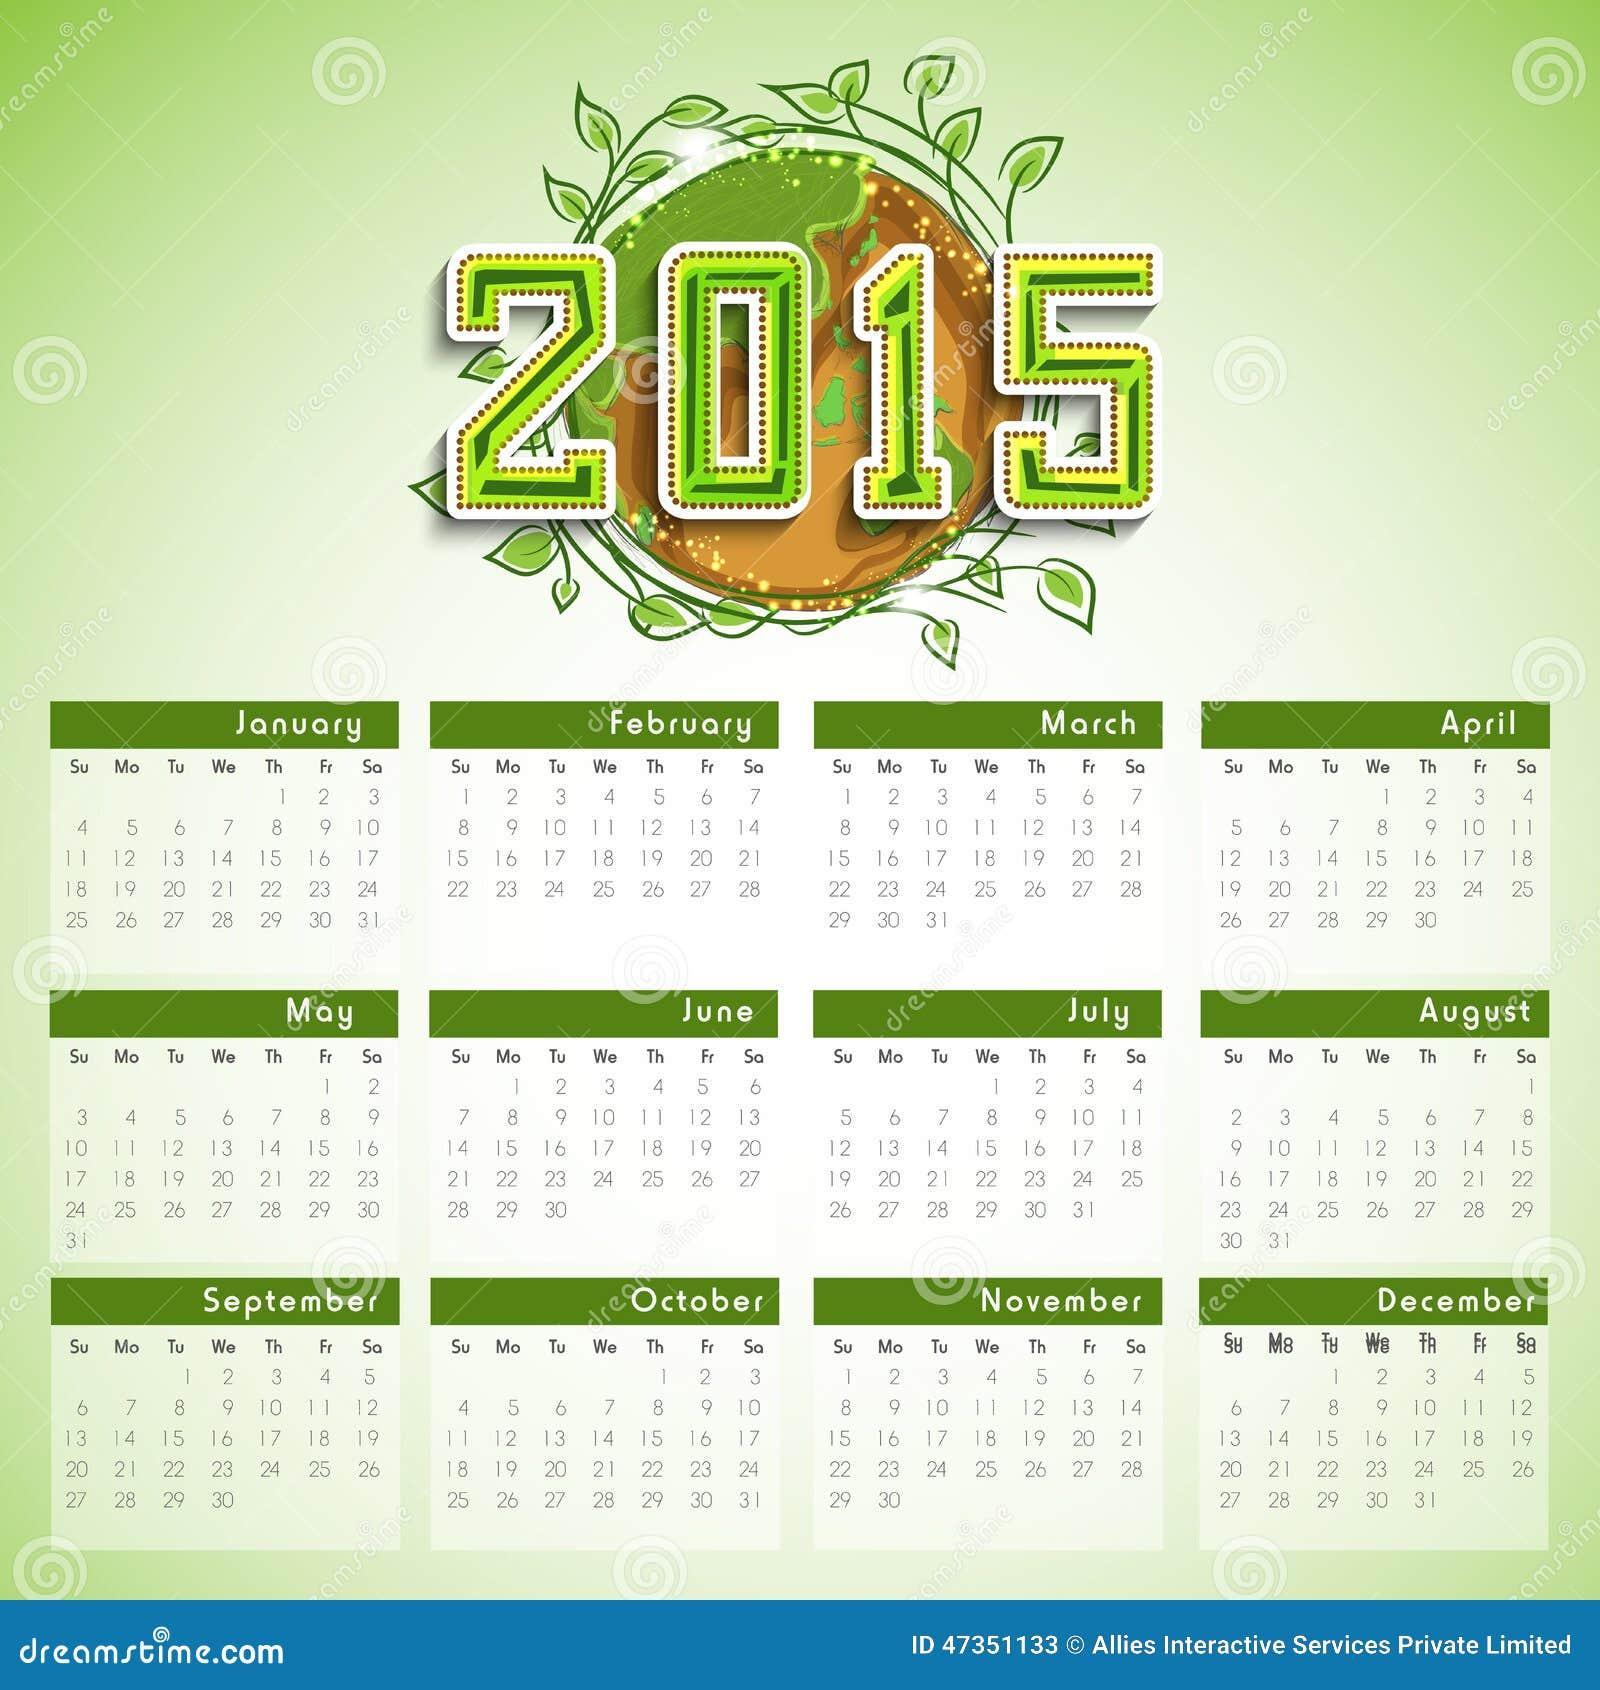 Calendar Design Concept : Year calendar design stock illustration image